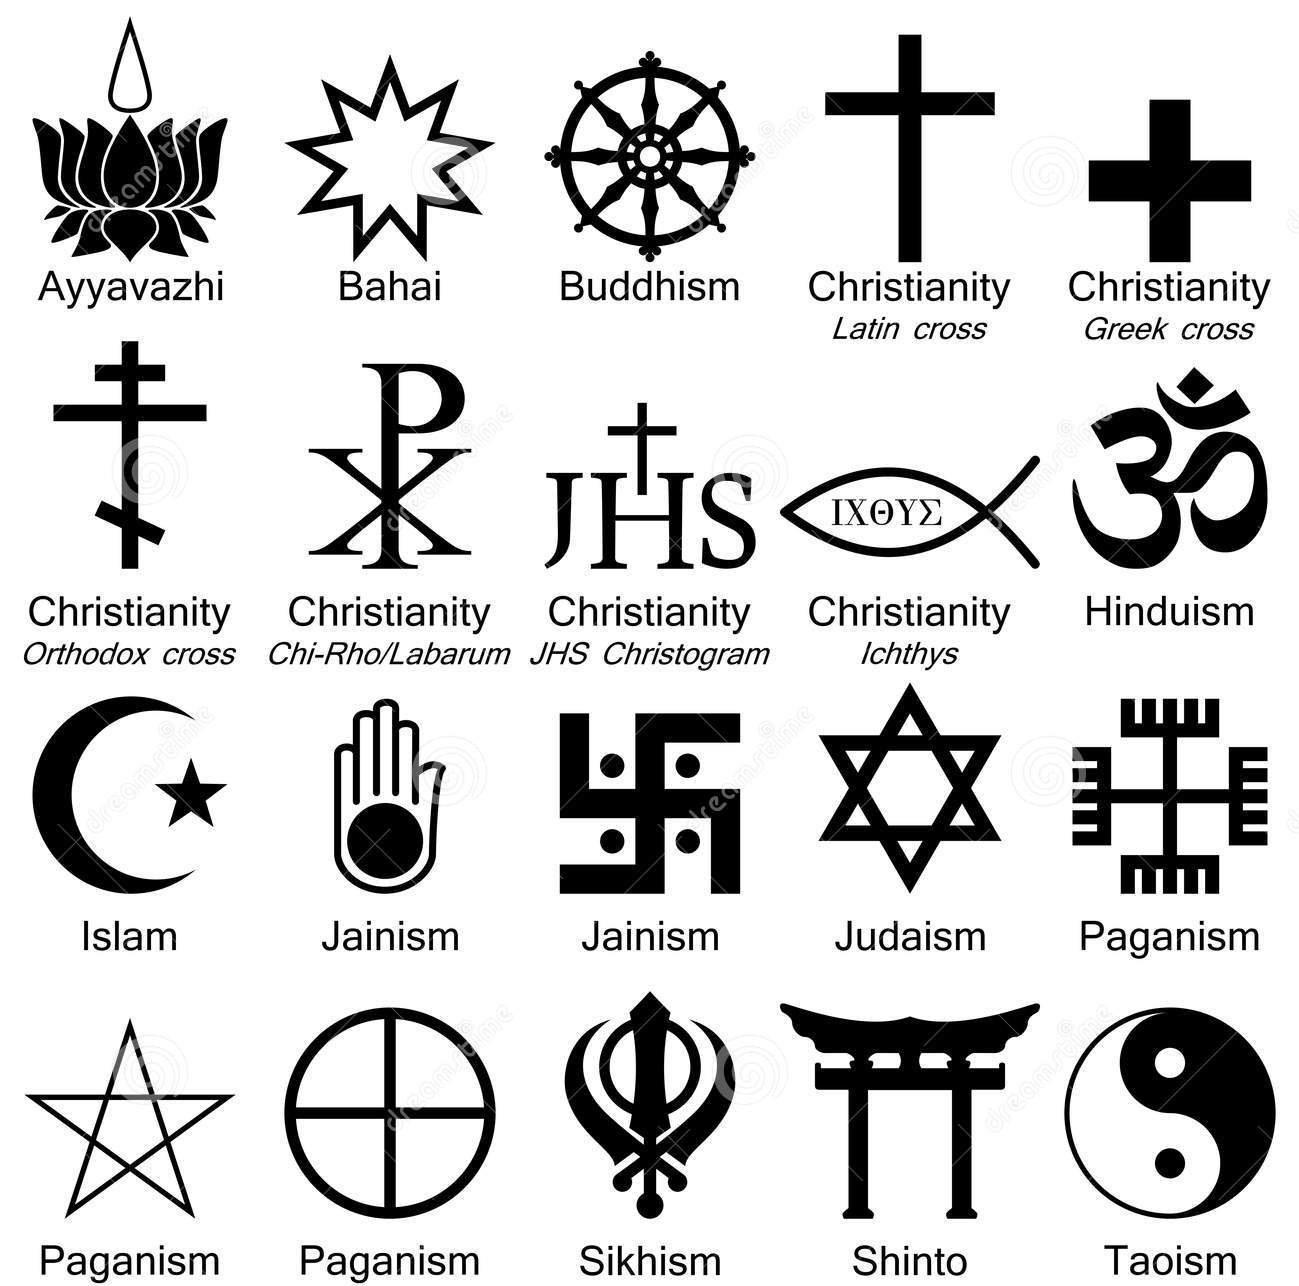 christianity judaism islam venn diagram gram negative cell wall matt stout on twitter quotreligion is like a penis it 39s